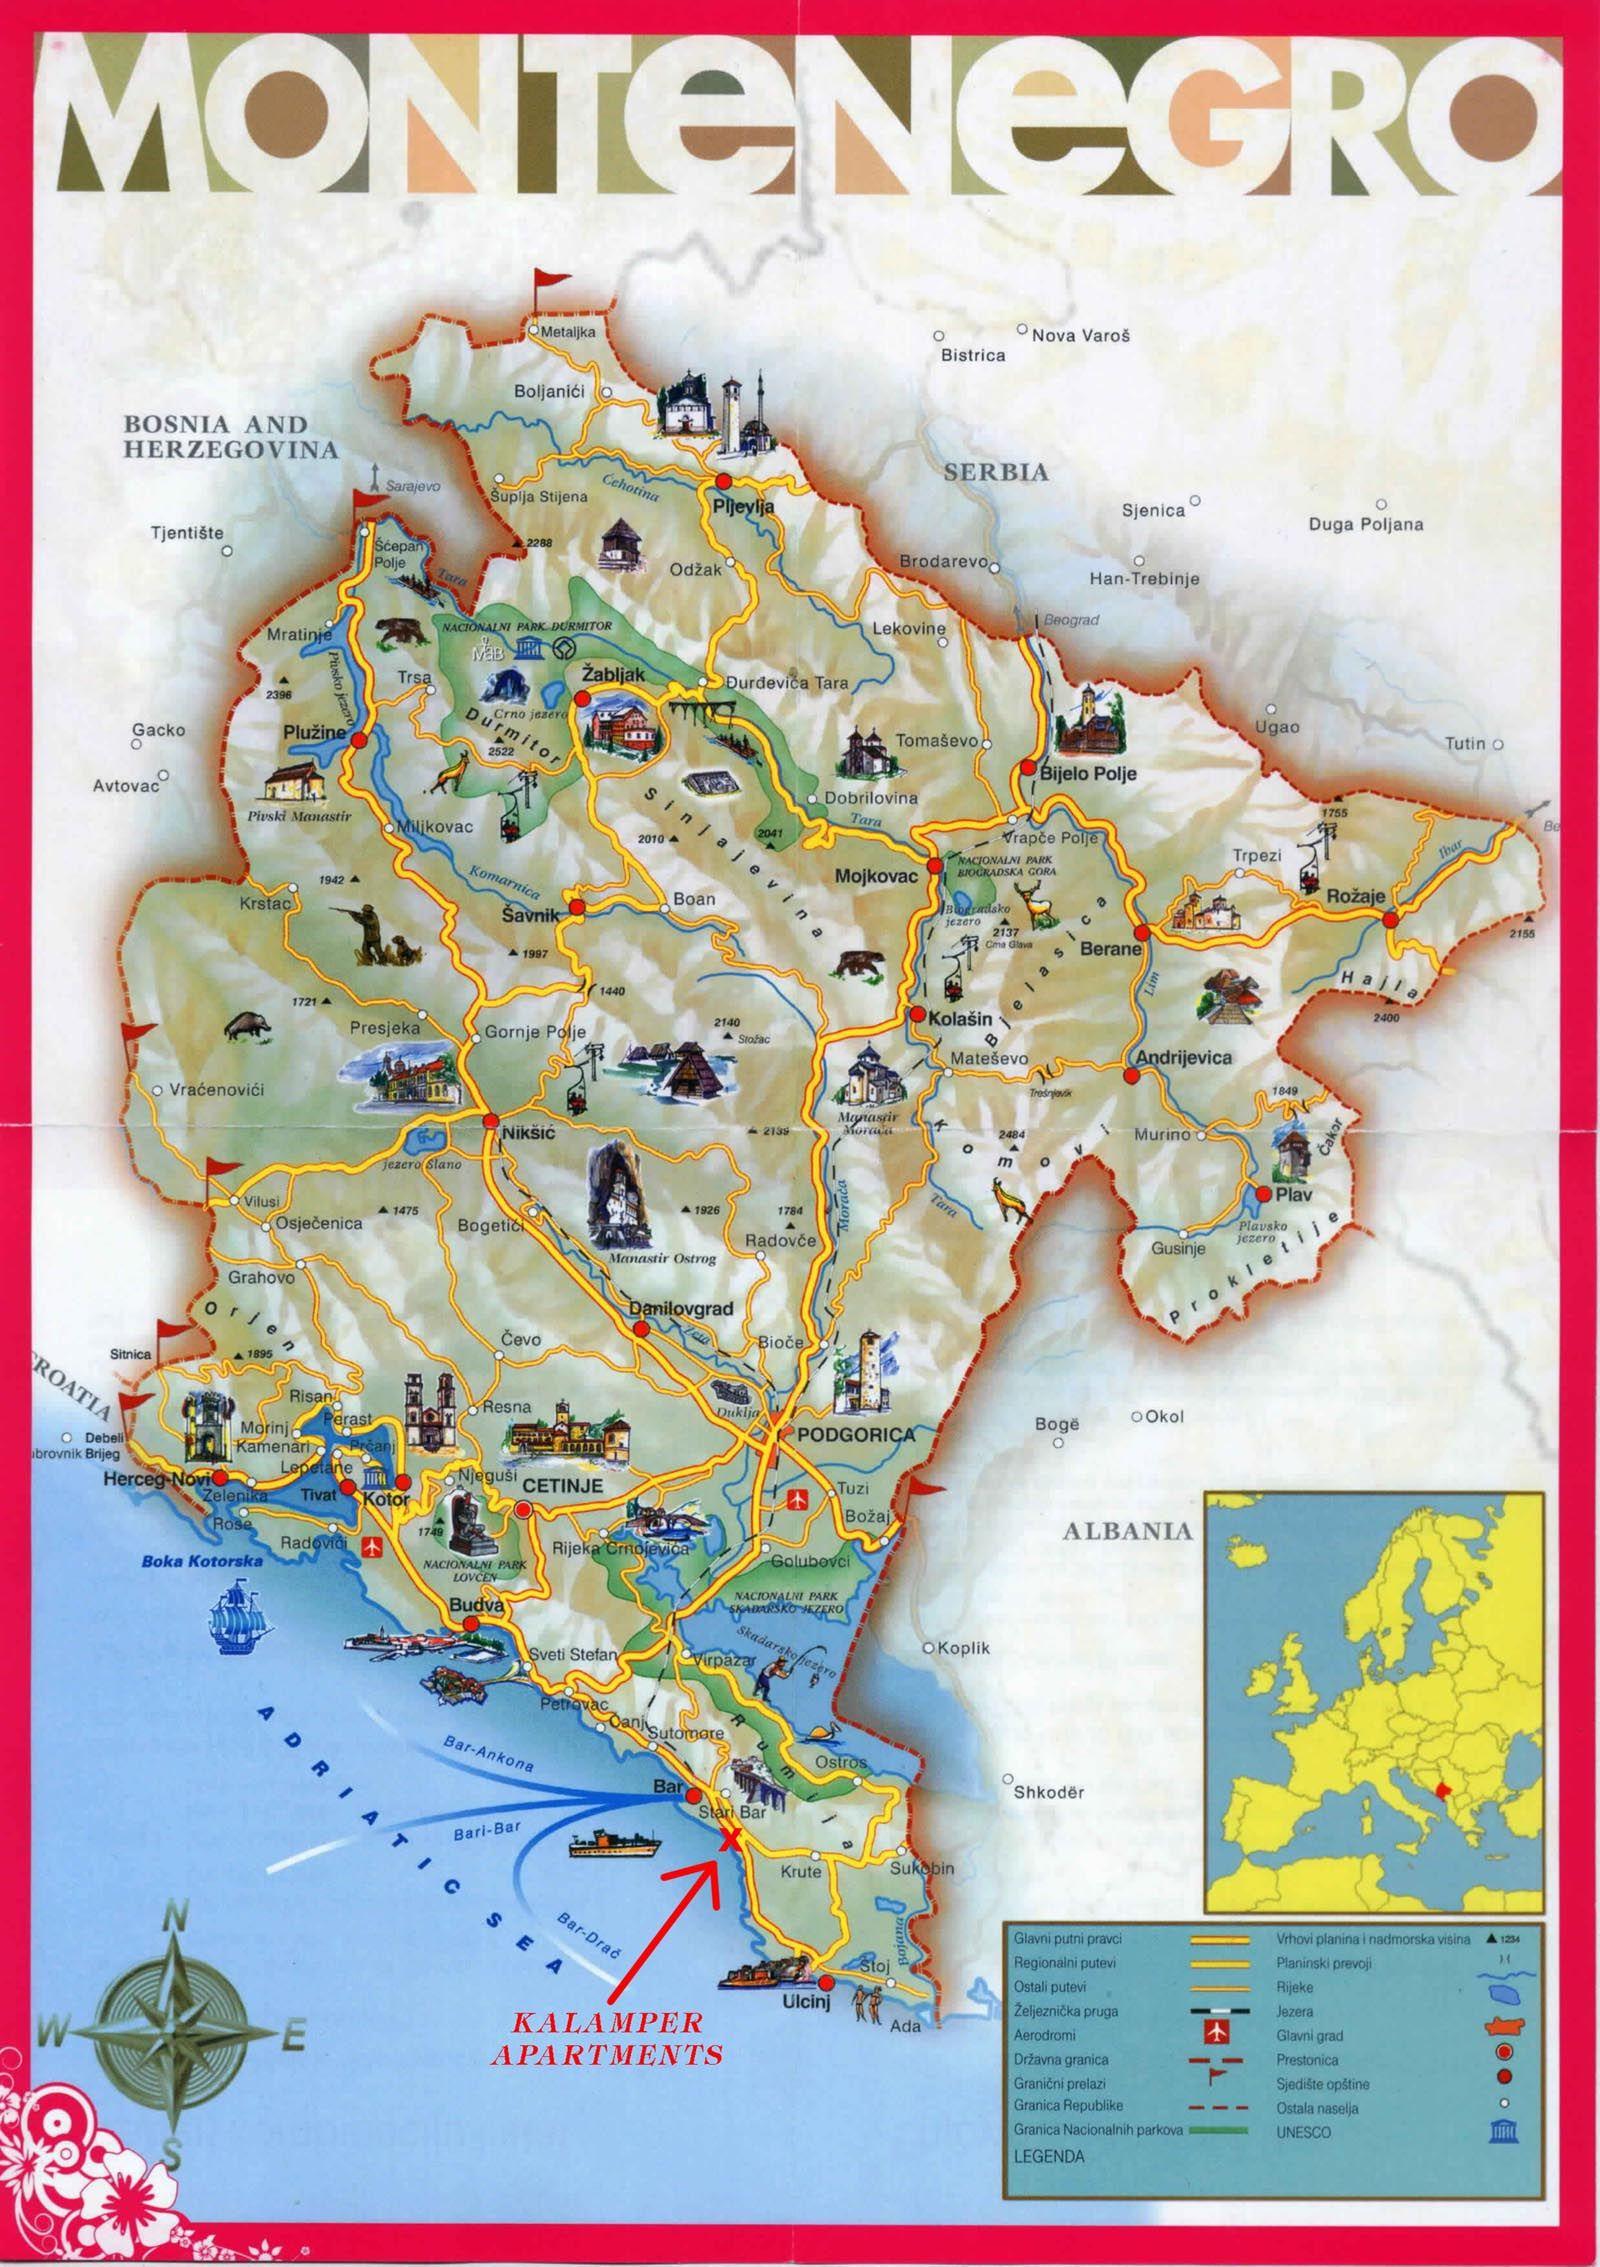 Montenegro Tourist Map Mappery Montenegro Travel Montenegro Map